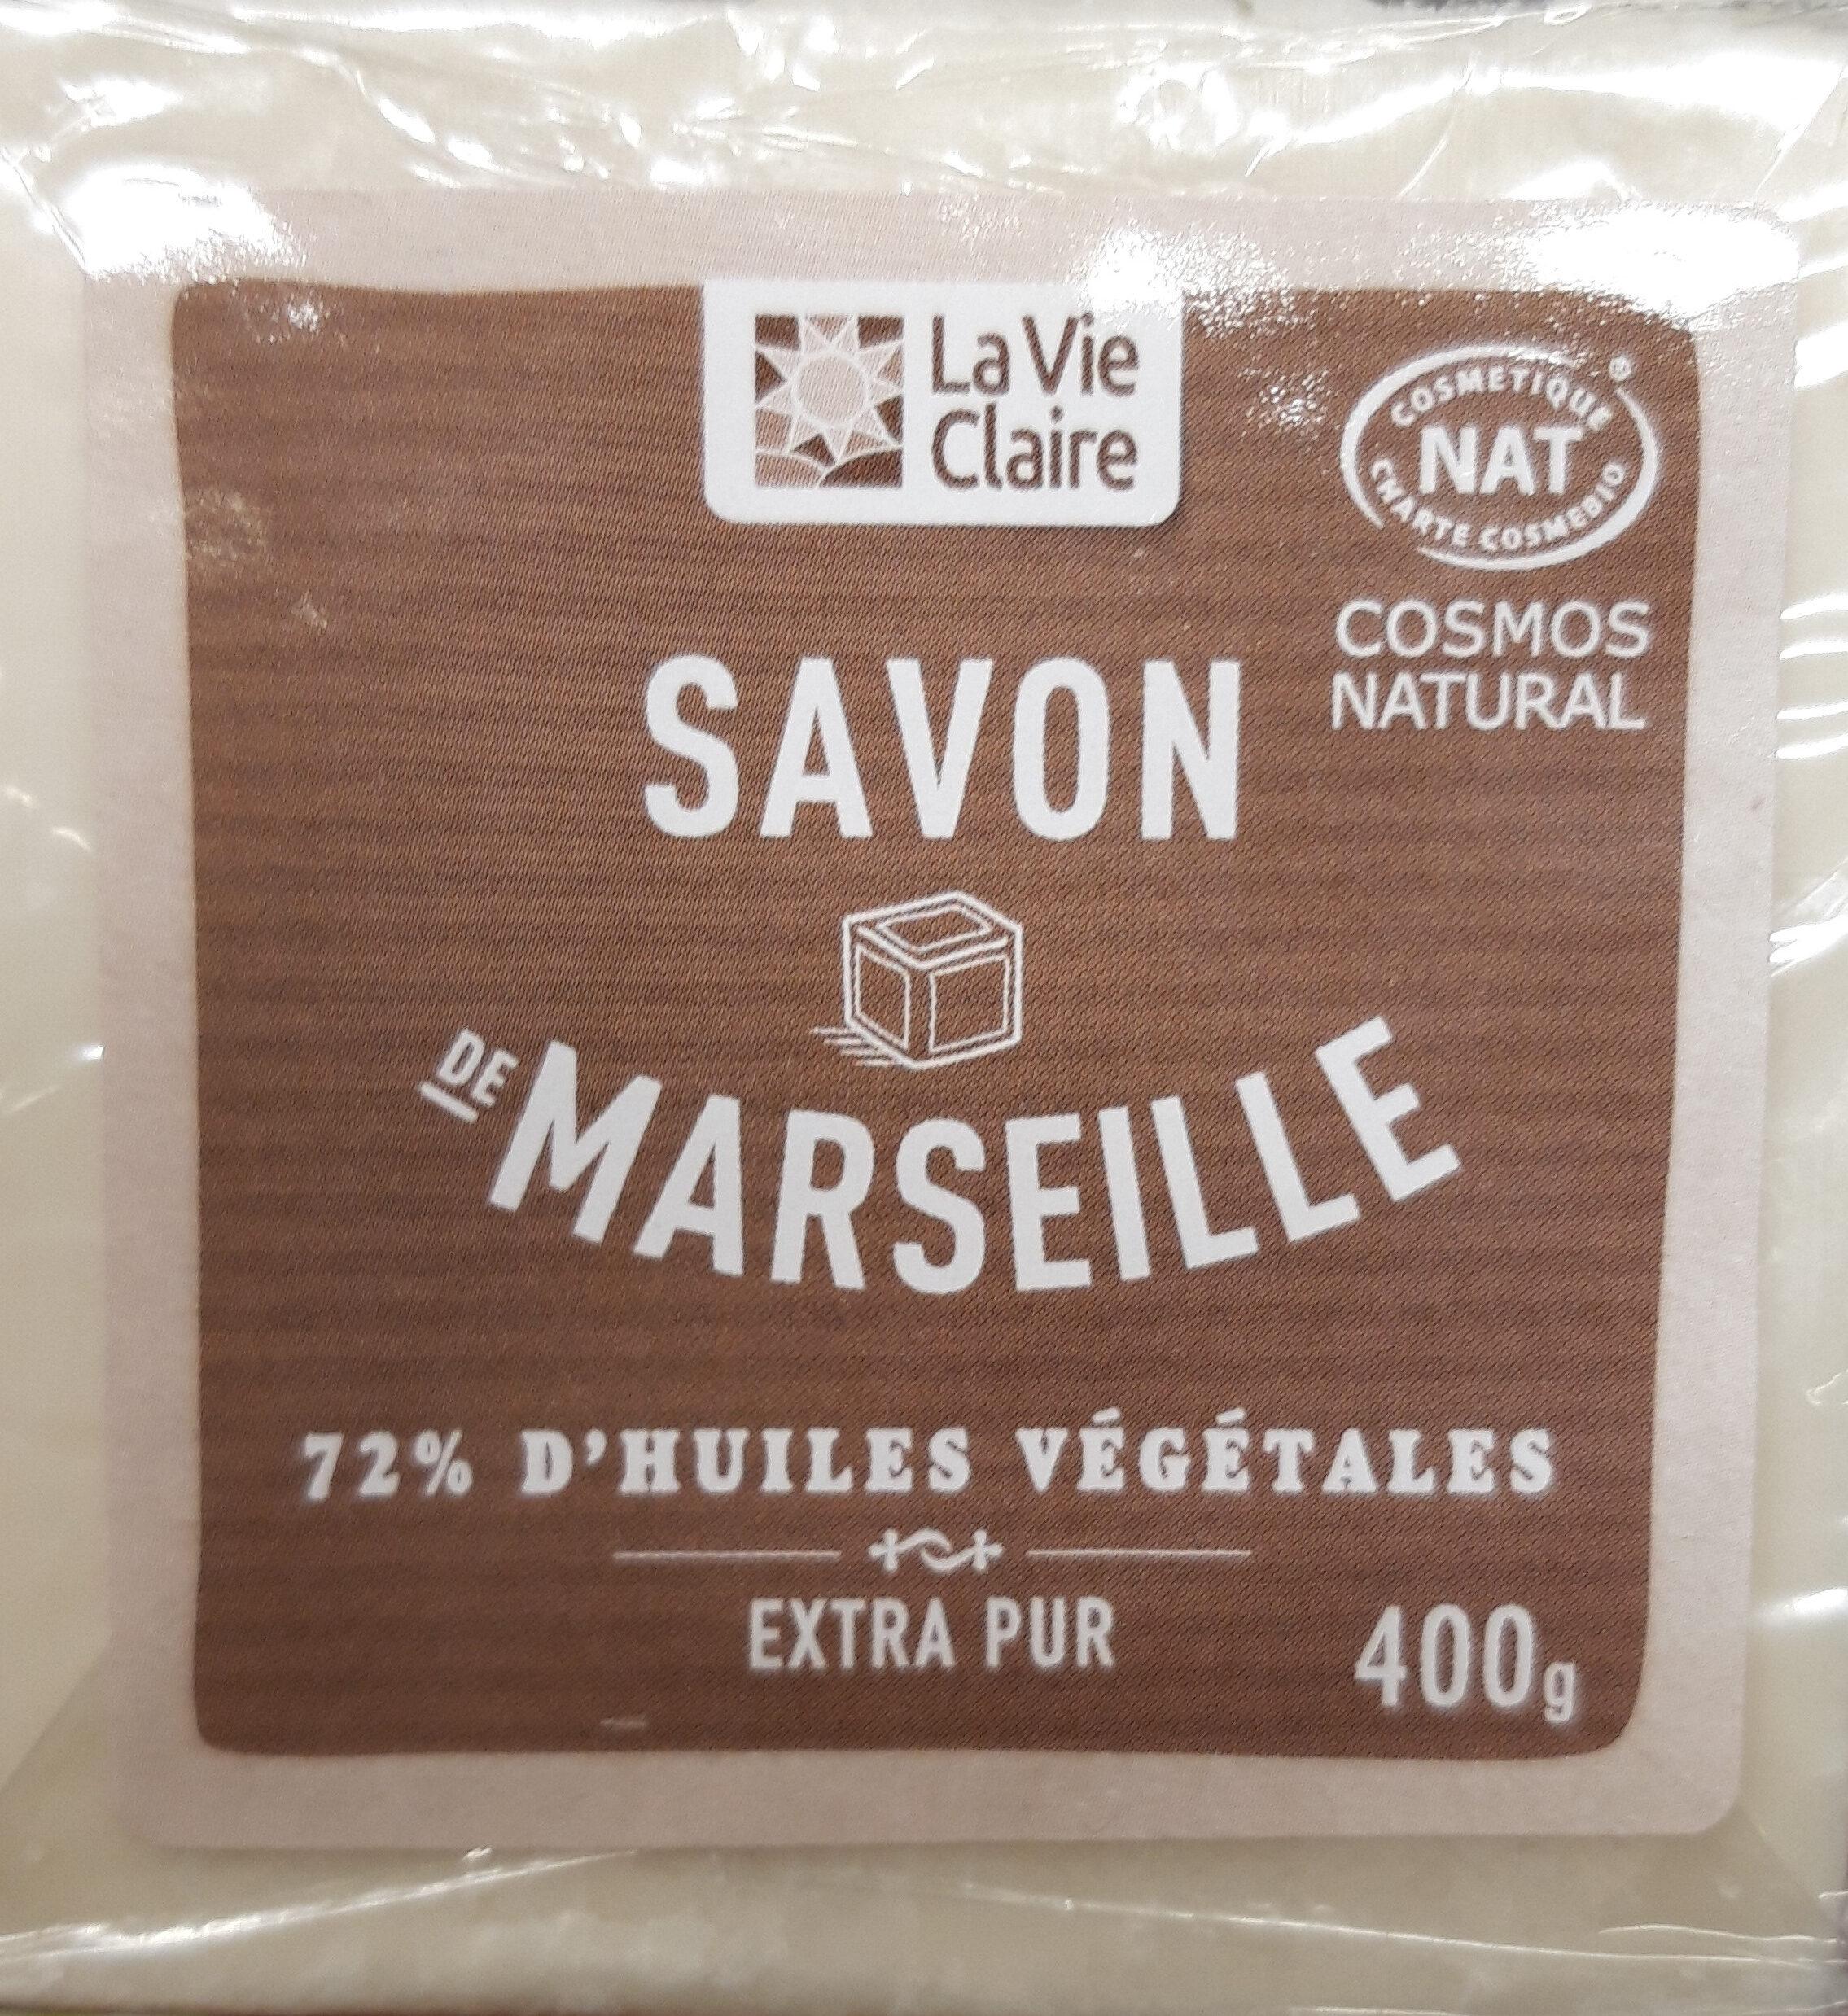 Savon de Marseille - Product - en